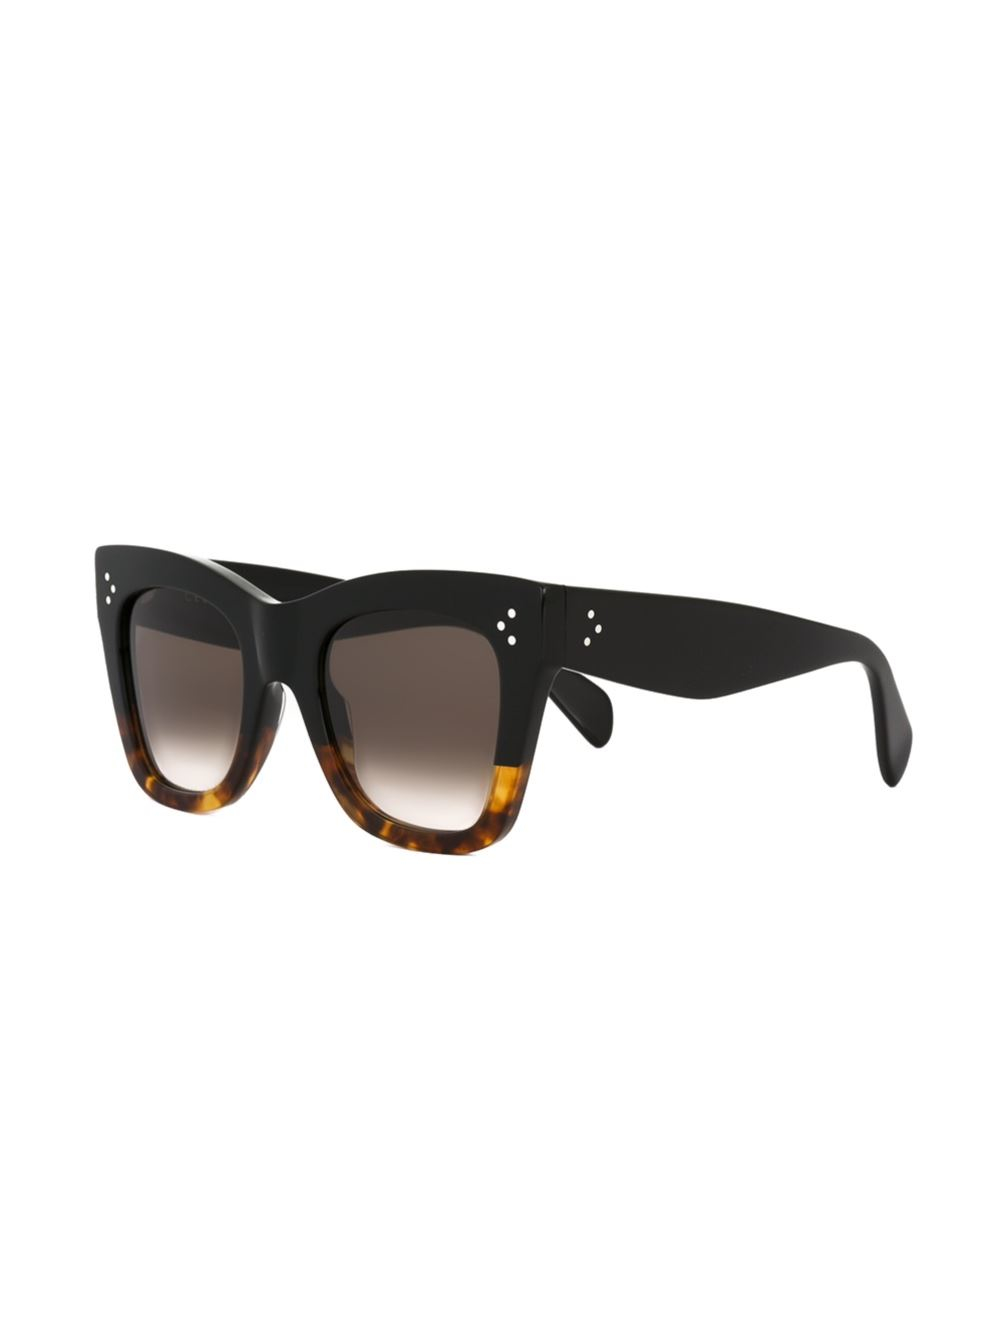 570007c37e Céline - Contrast Frame Cat Eye Sunglasses - Women - Acetate - One Size in  Black